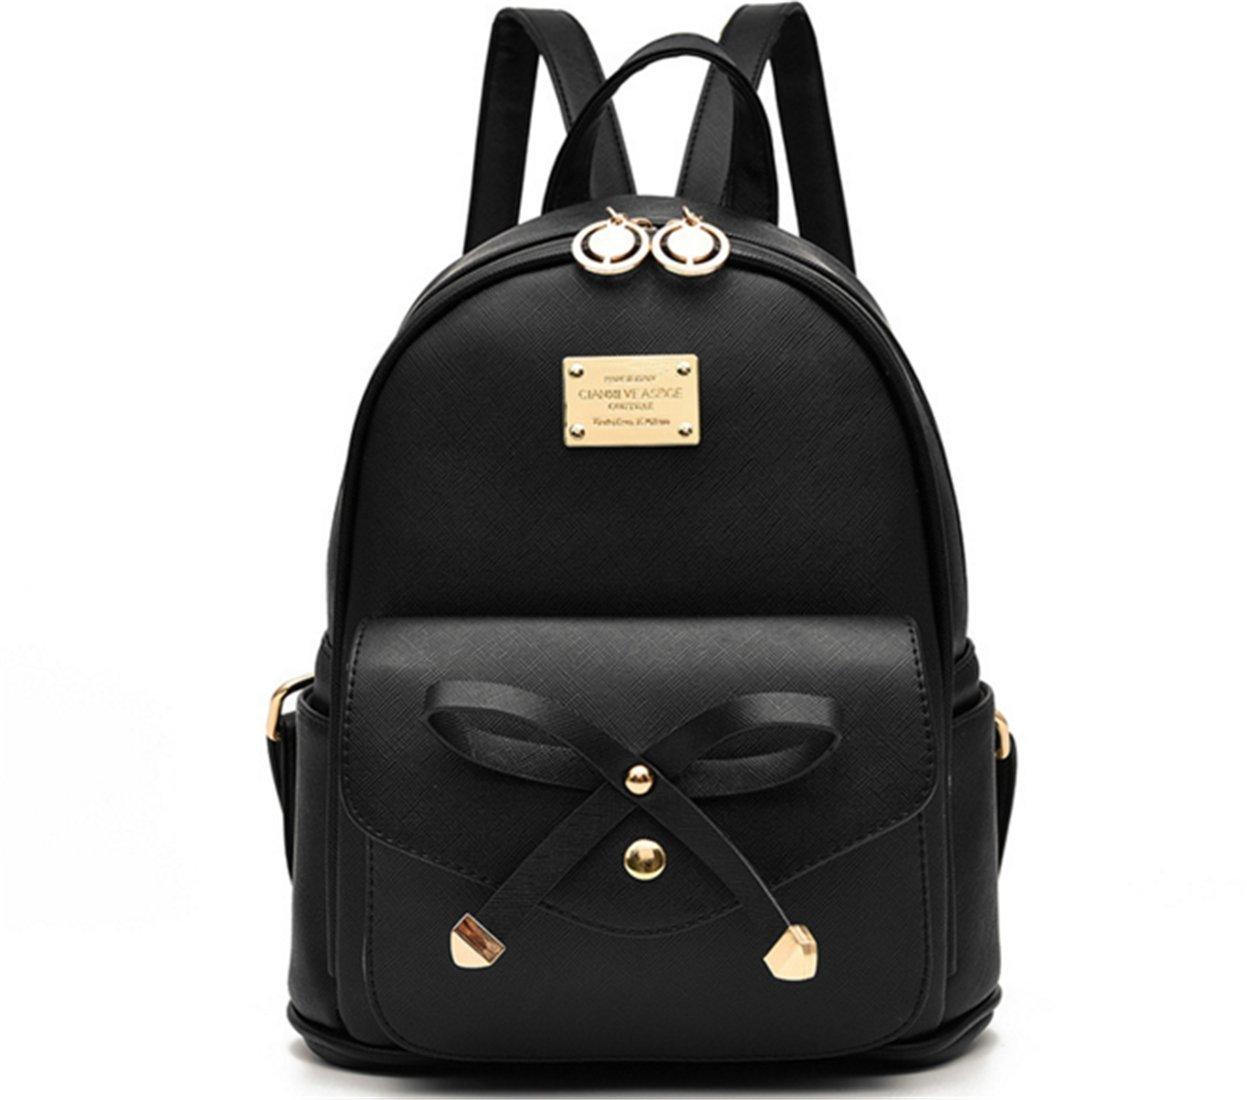 Nodykka Women Backpack Shoulder Bag Mini Cute Leather Crossbody Purse Tote Satchel Handbags